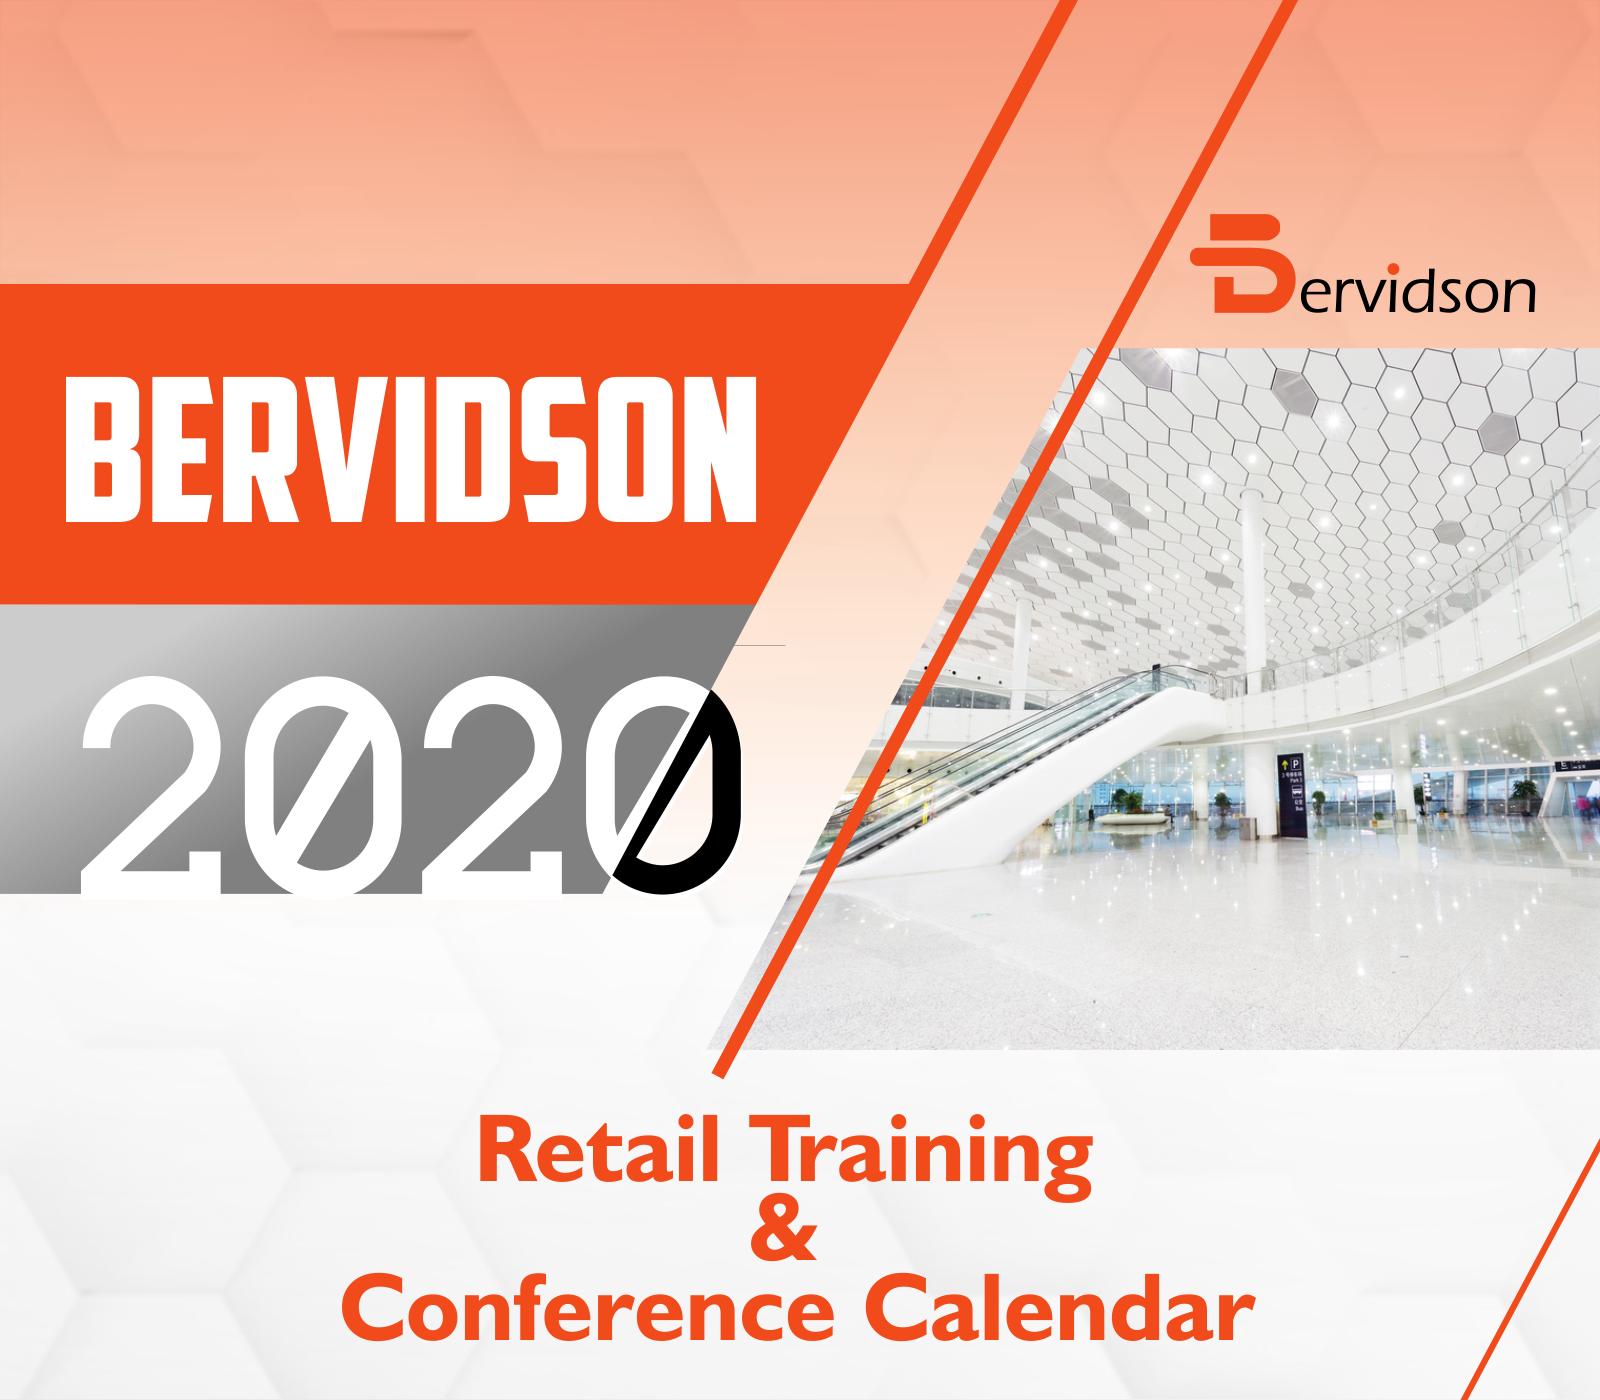 Retail Training & Conference Calendar 2020